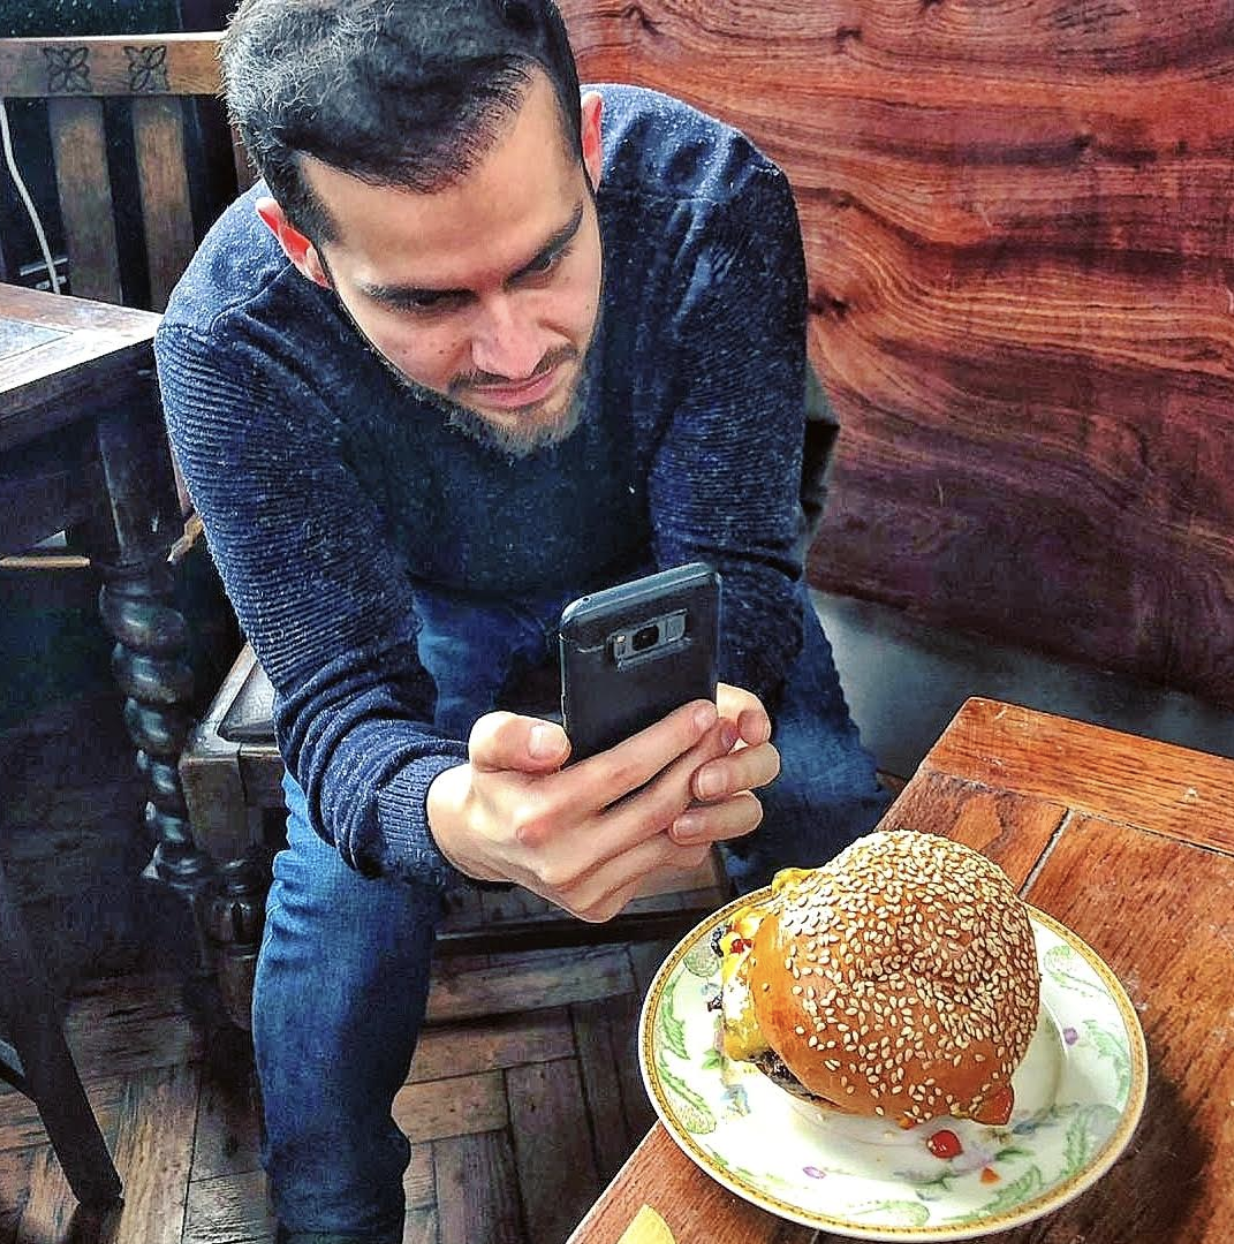 #burgersearcher - Food Blogger & PhotographerFind me: Instagram